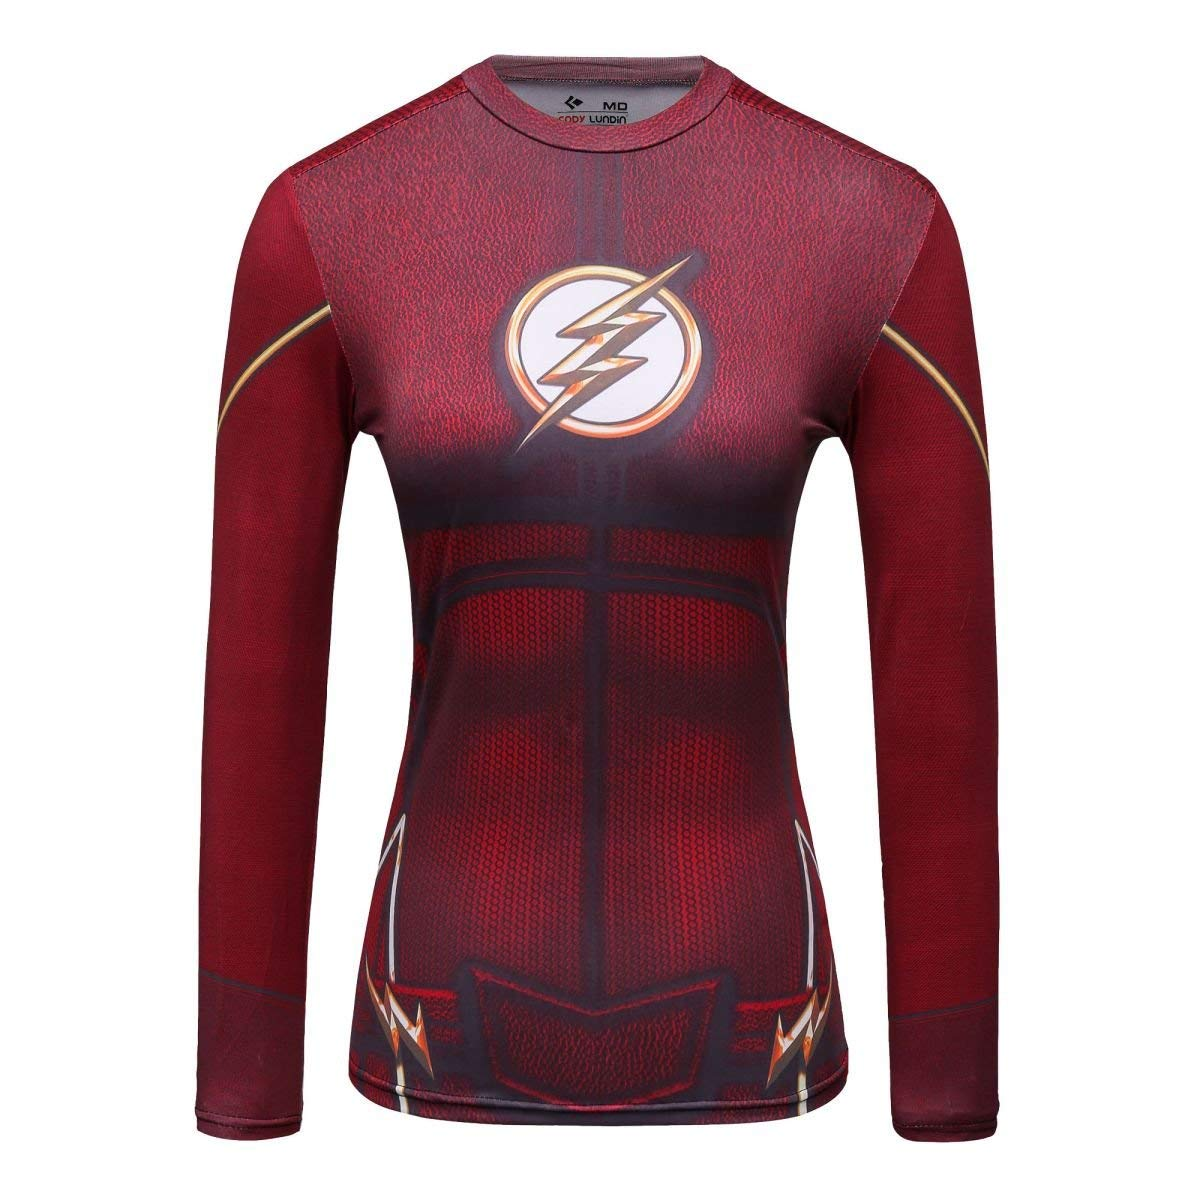 The Flash Superhero Compression Tee Shirt